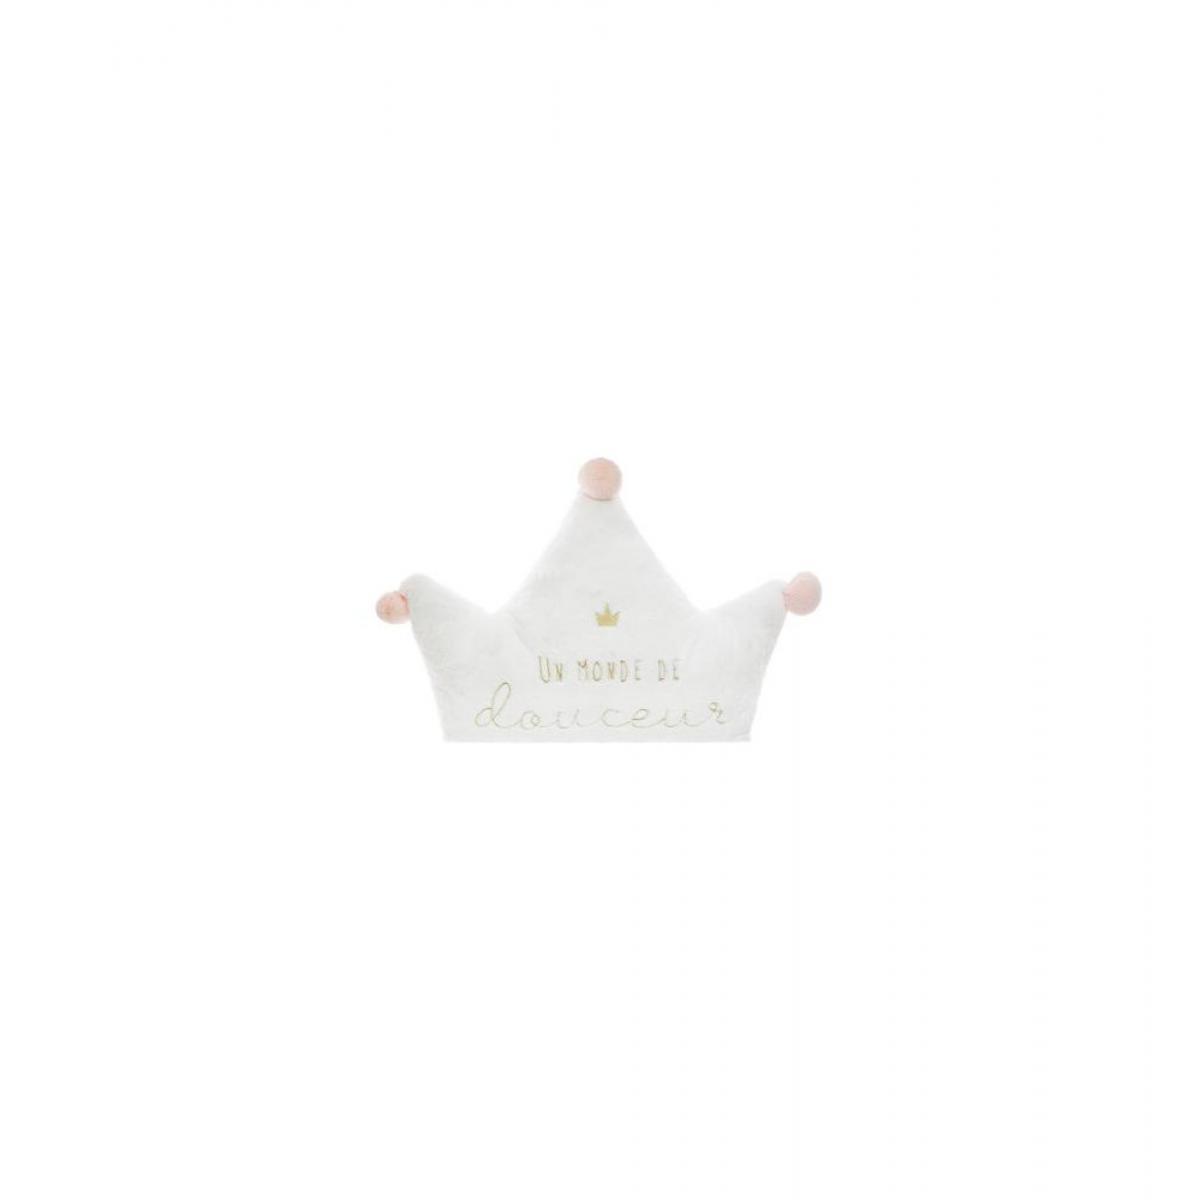 Ac-Deco Maxi coussin princesse - L 68 x l 53 cm - Multicolore